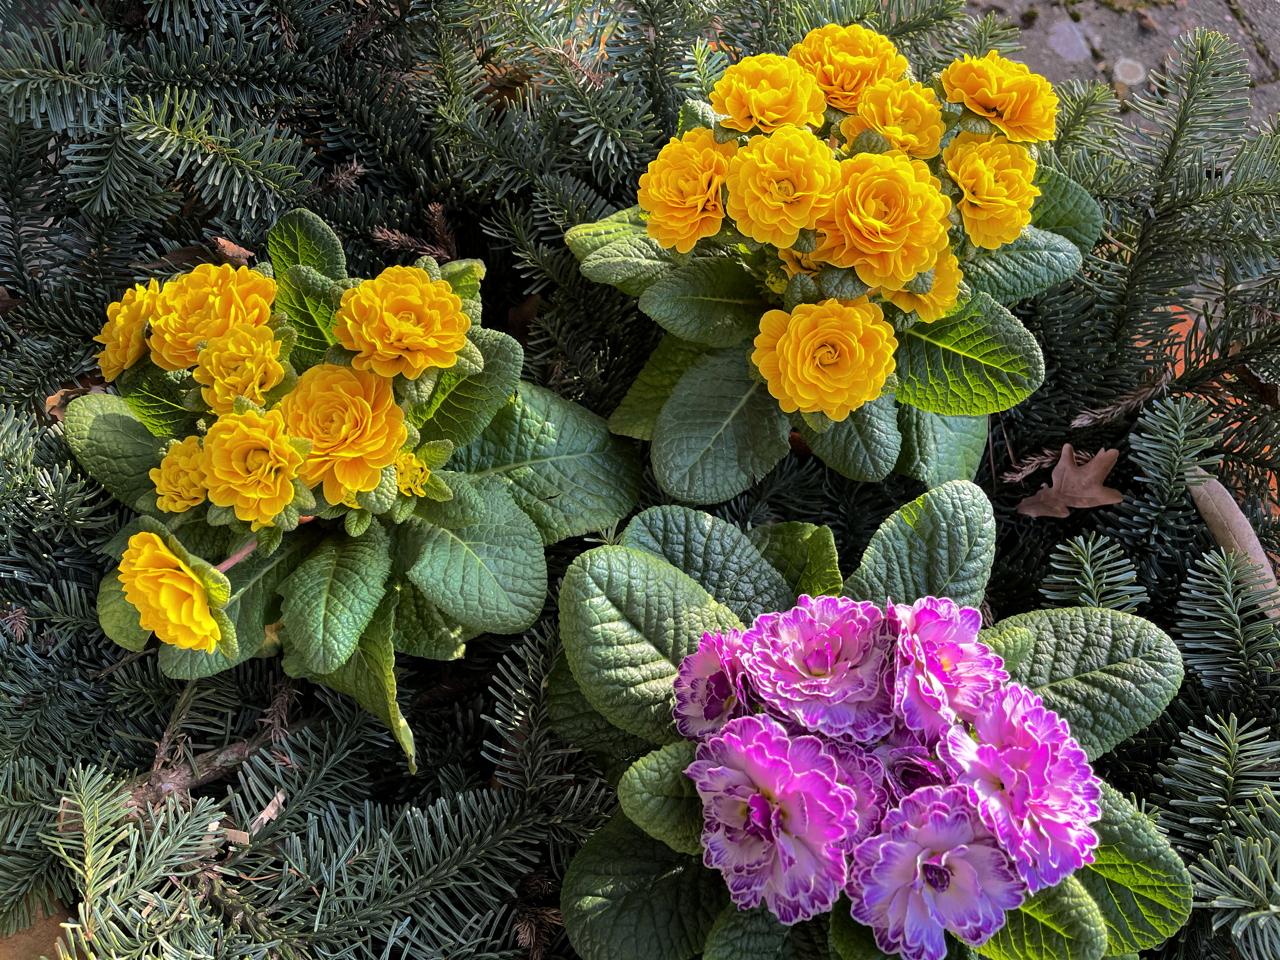 Spring is in the air. Die Primel Schlüsselblume Himmelsschlüssel Frühlingsblumen